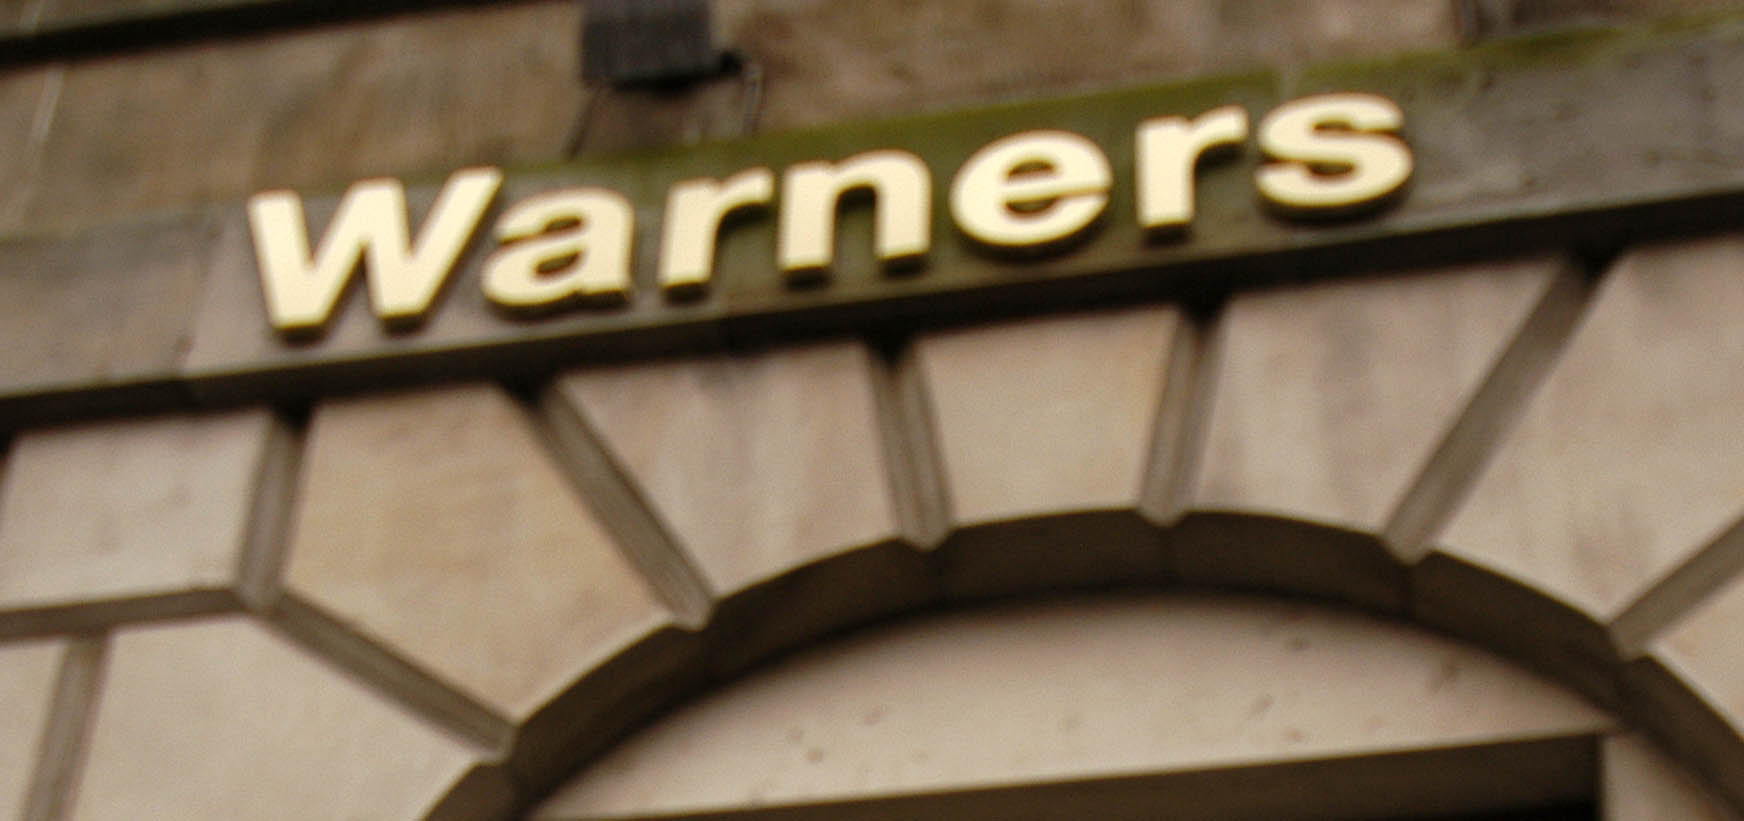 Edinburgh PR agency help Edinburgh's leading solicitor and estate agent take over the headline